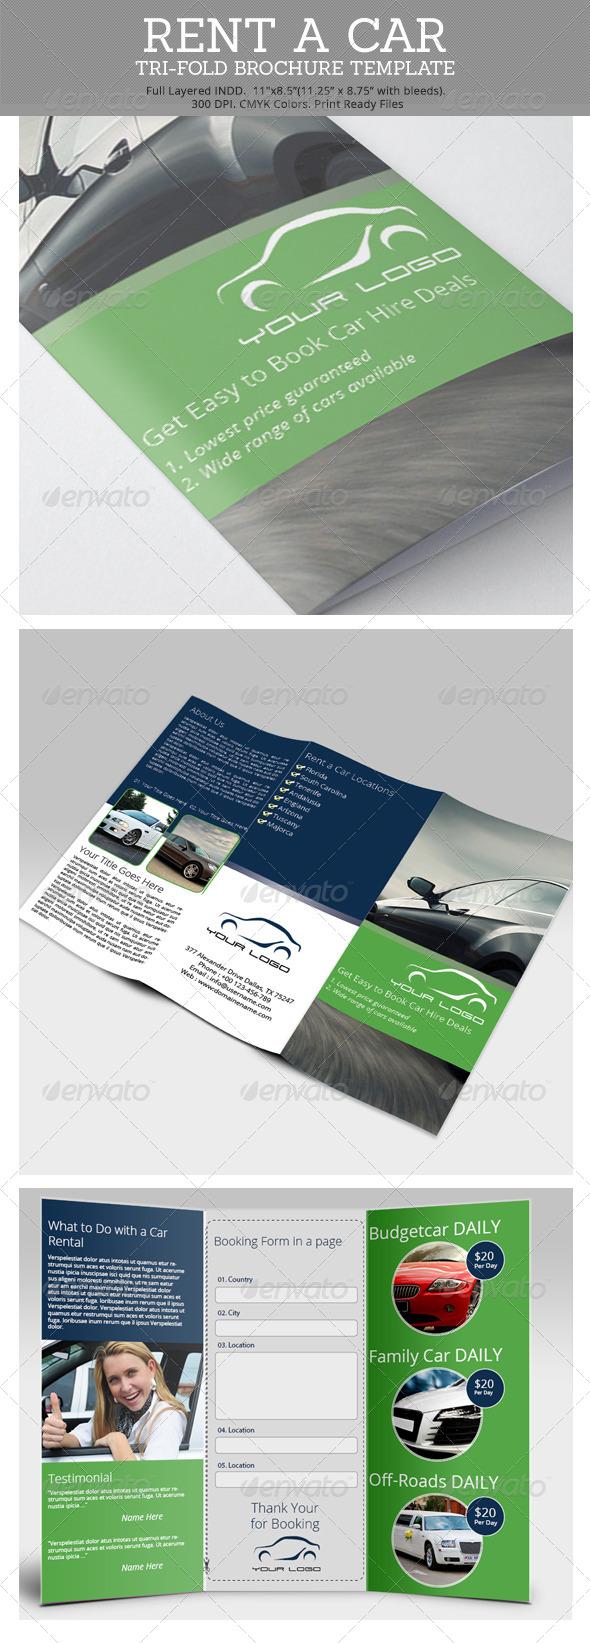 GraphicRiver Rent a Car Tri-Fold Brochure Template 6725849